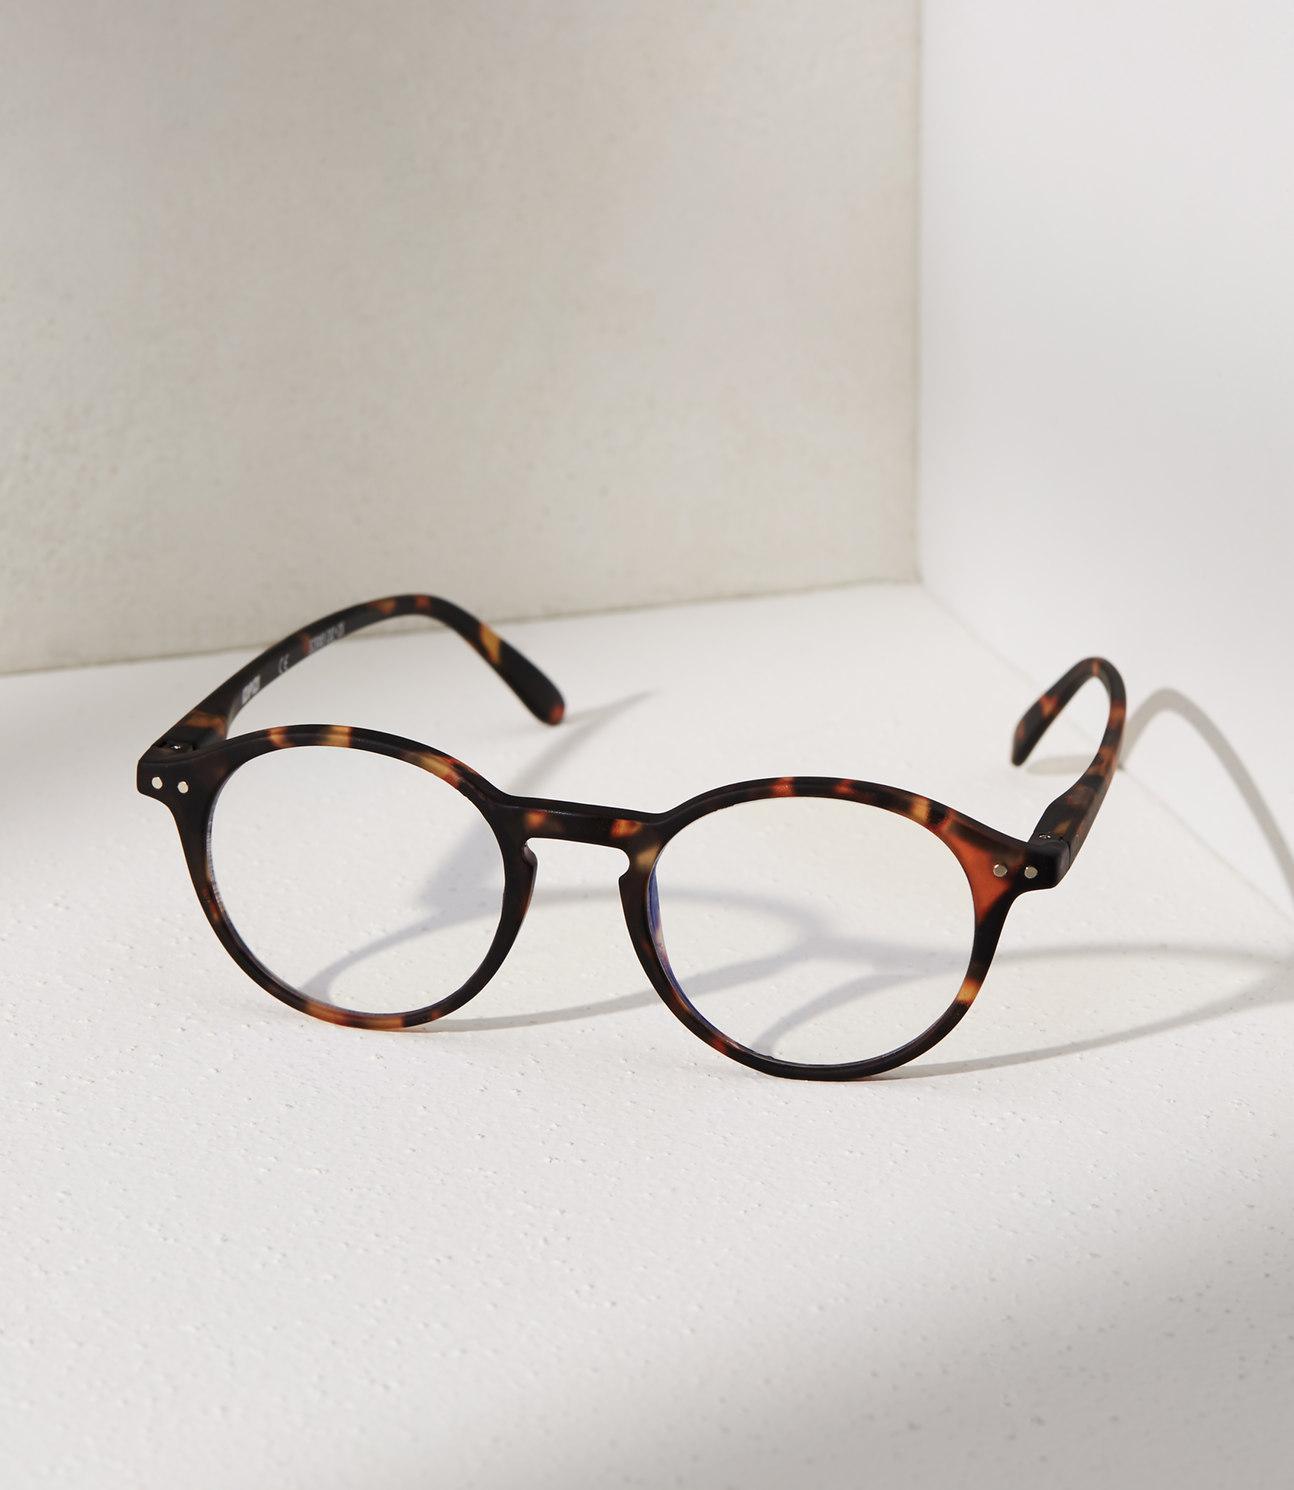 434b293a19 Lyst - Lou   Grey Izipizi  d Screen Reading Glasses in Brown